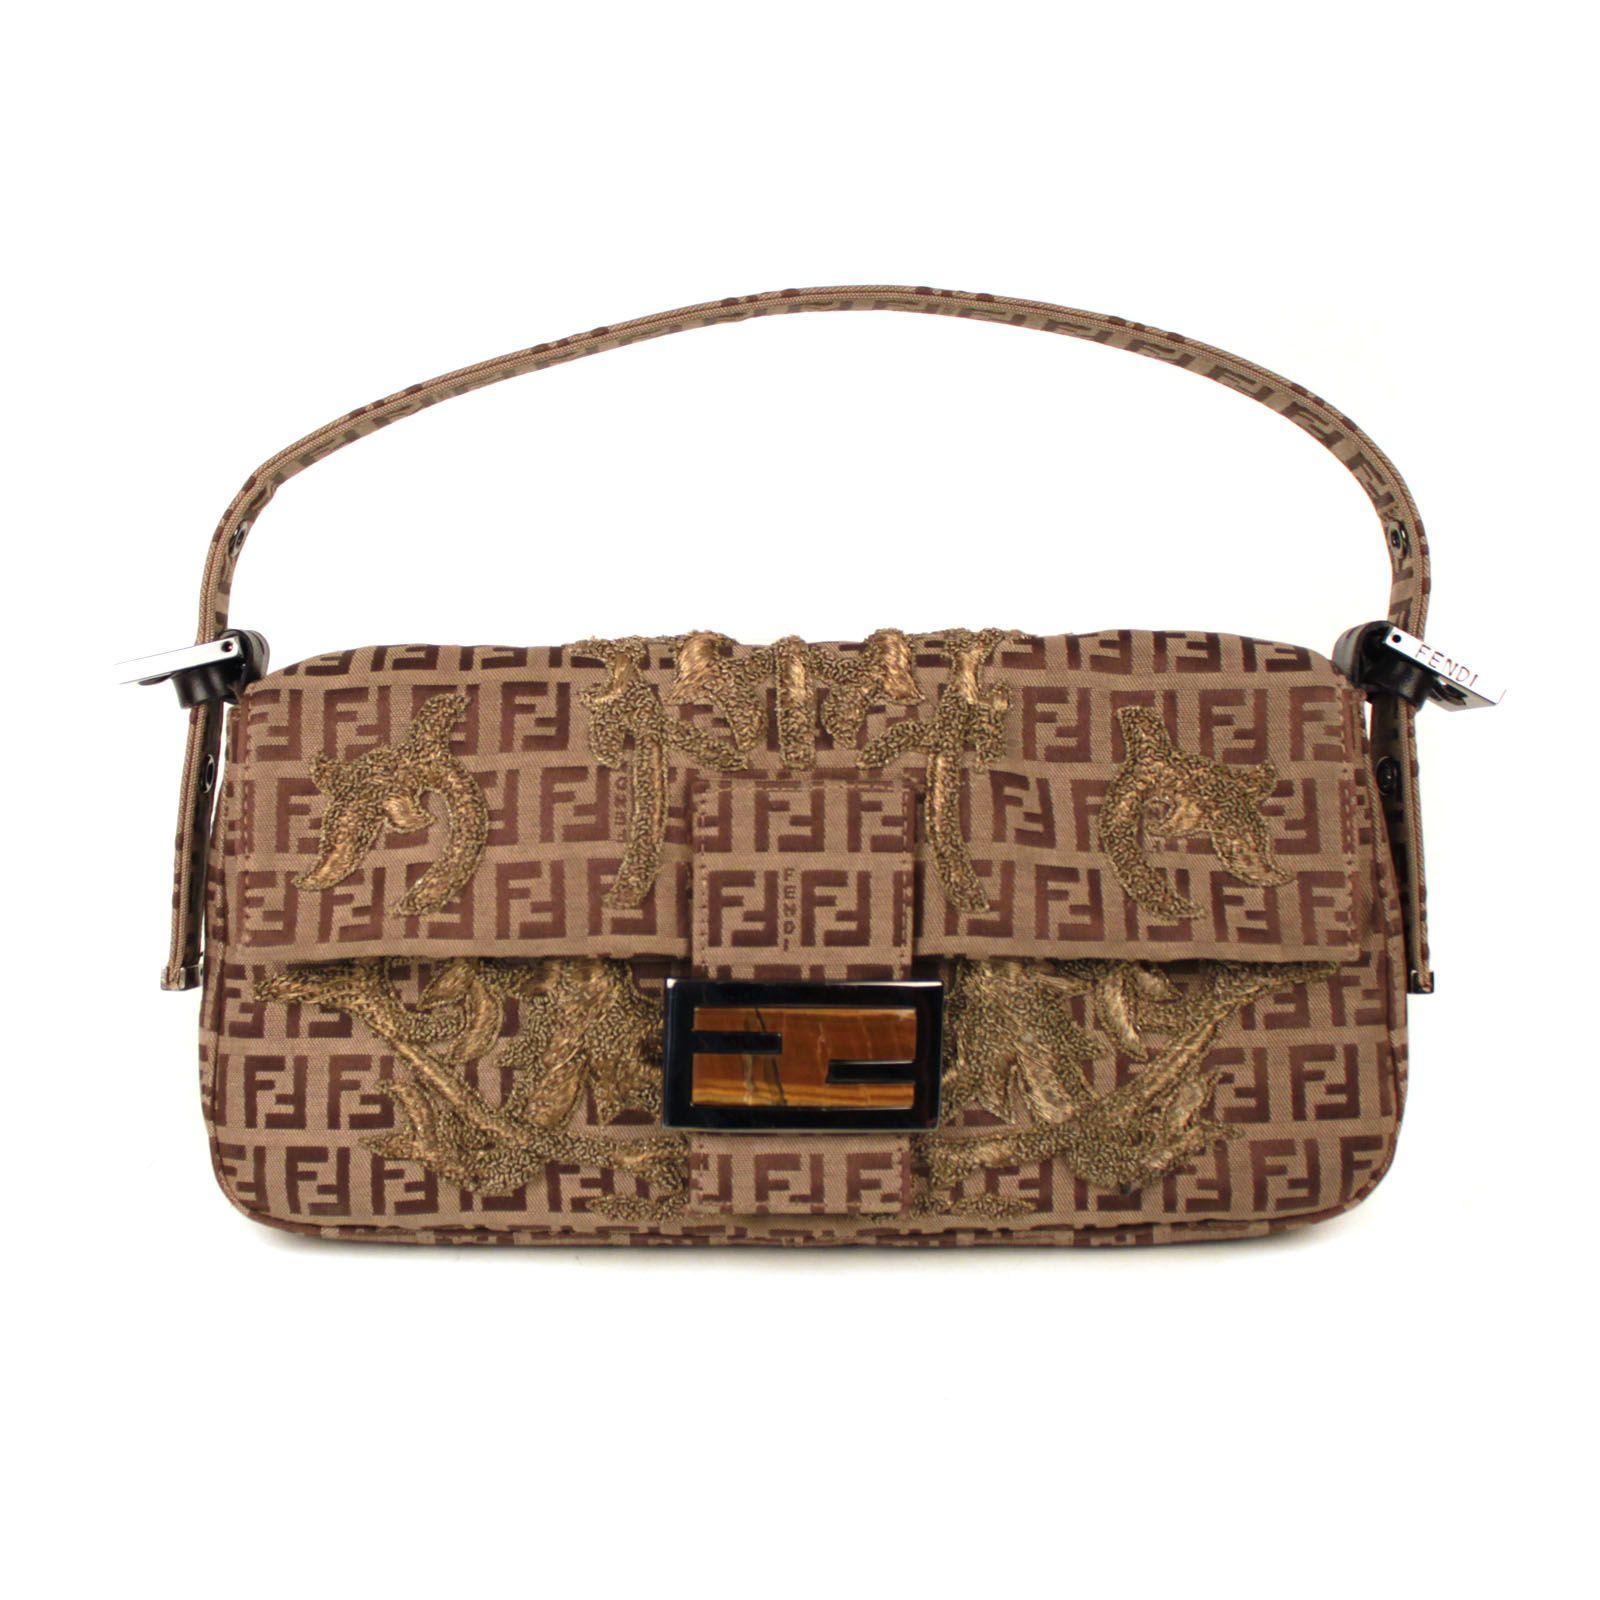 Borse fendi : Hermes borse fendi leather wallet